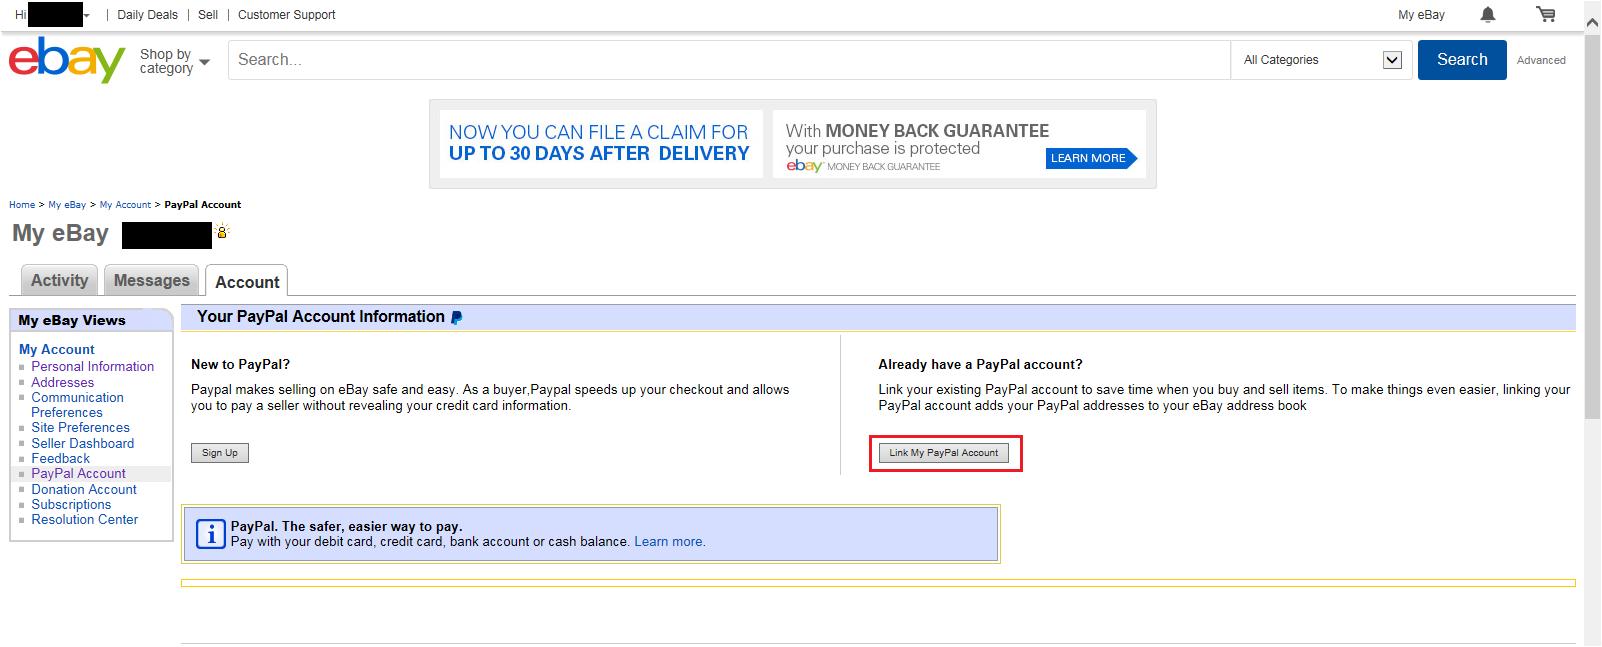 ebay Registration